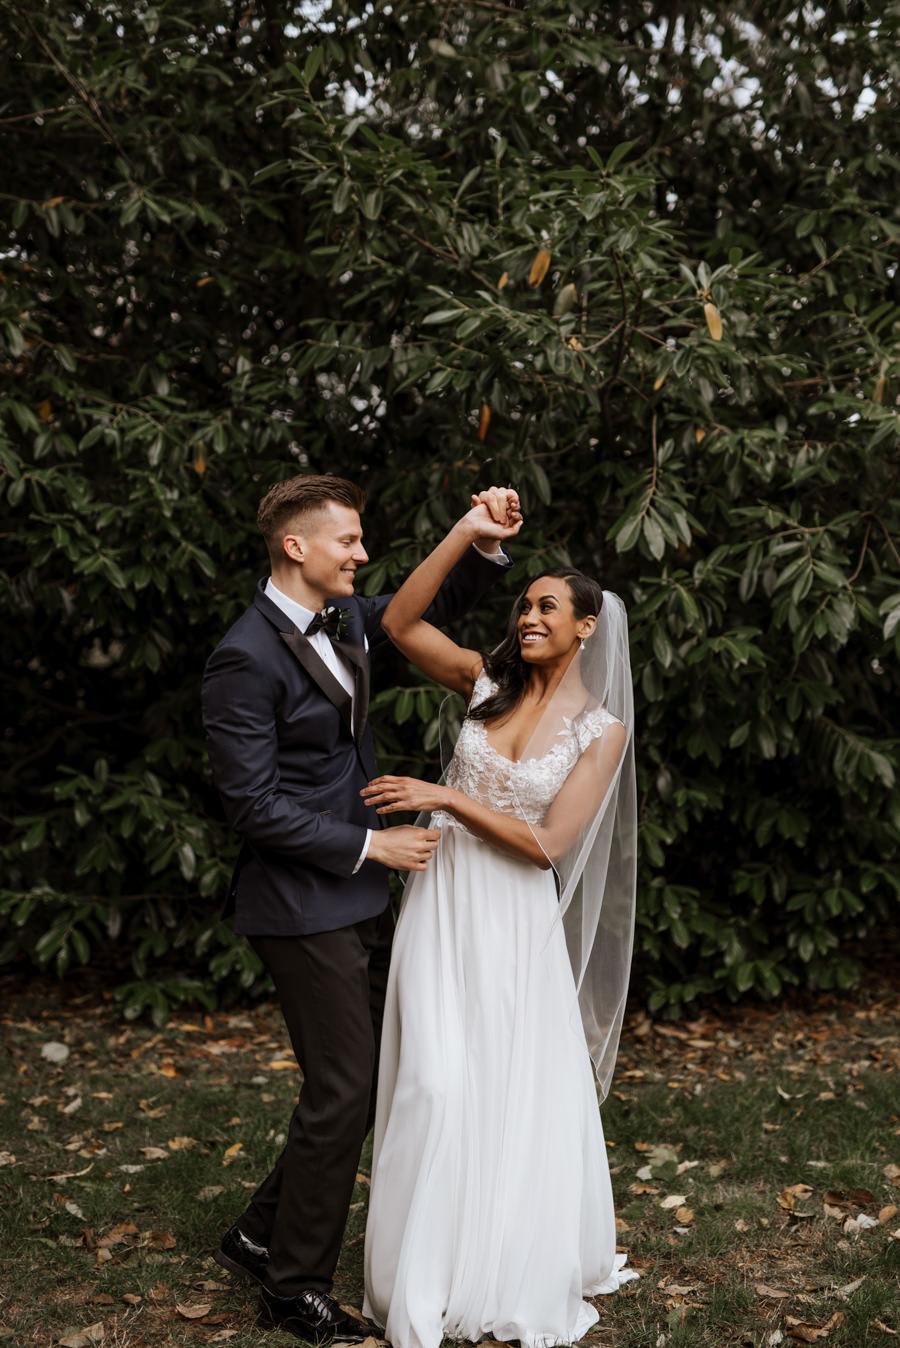 vancouver-wedding-and-elopement-photographer-kaoverii-silva-75.jpg